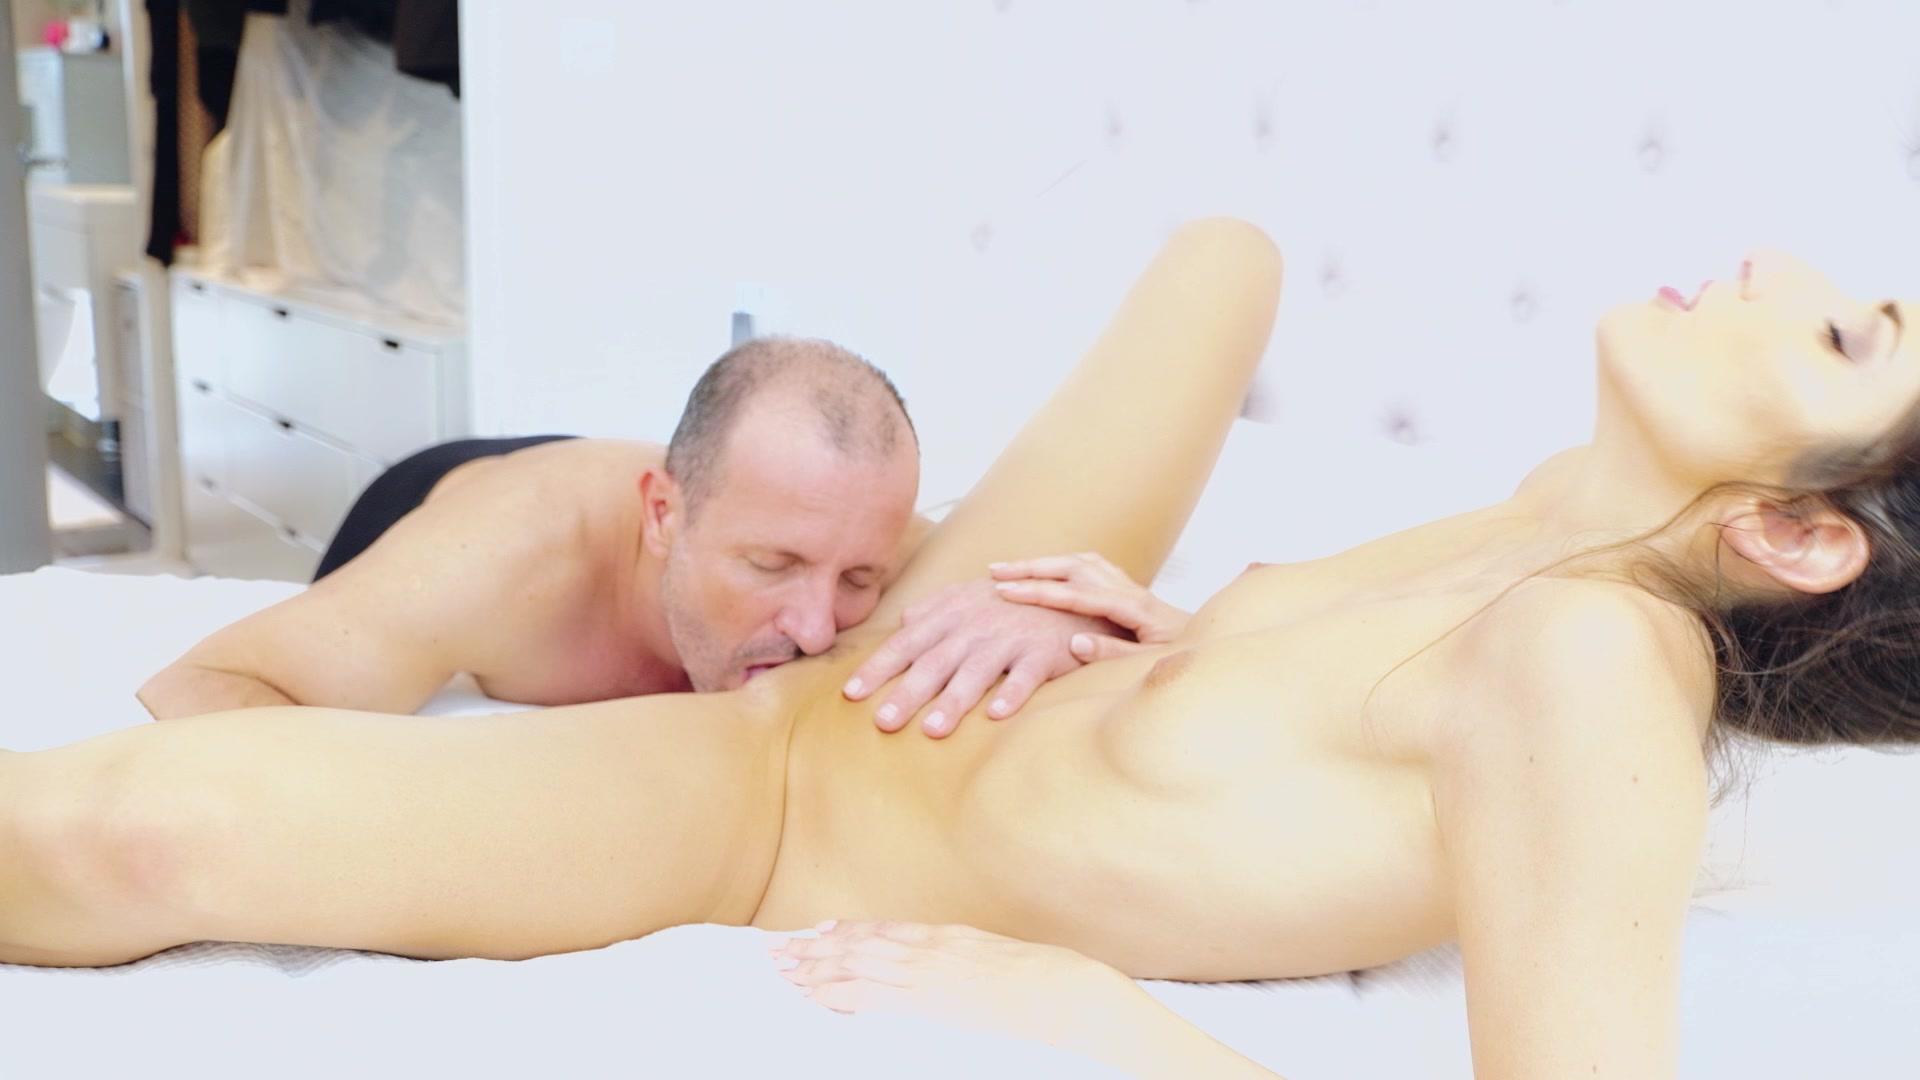 Brunette Hottie Clea Gautier Sucks and Fucks a Big Dick HD porn video scene.